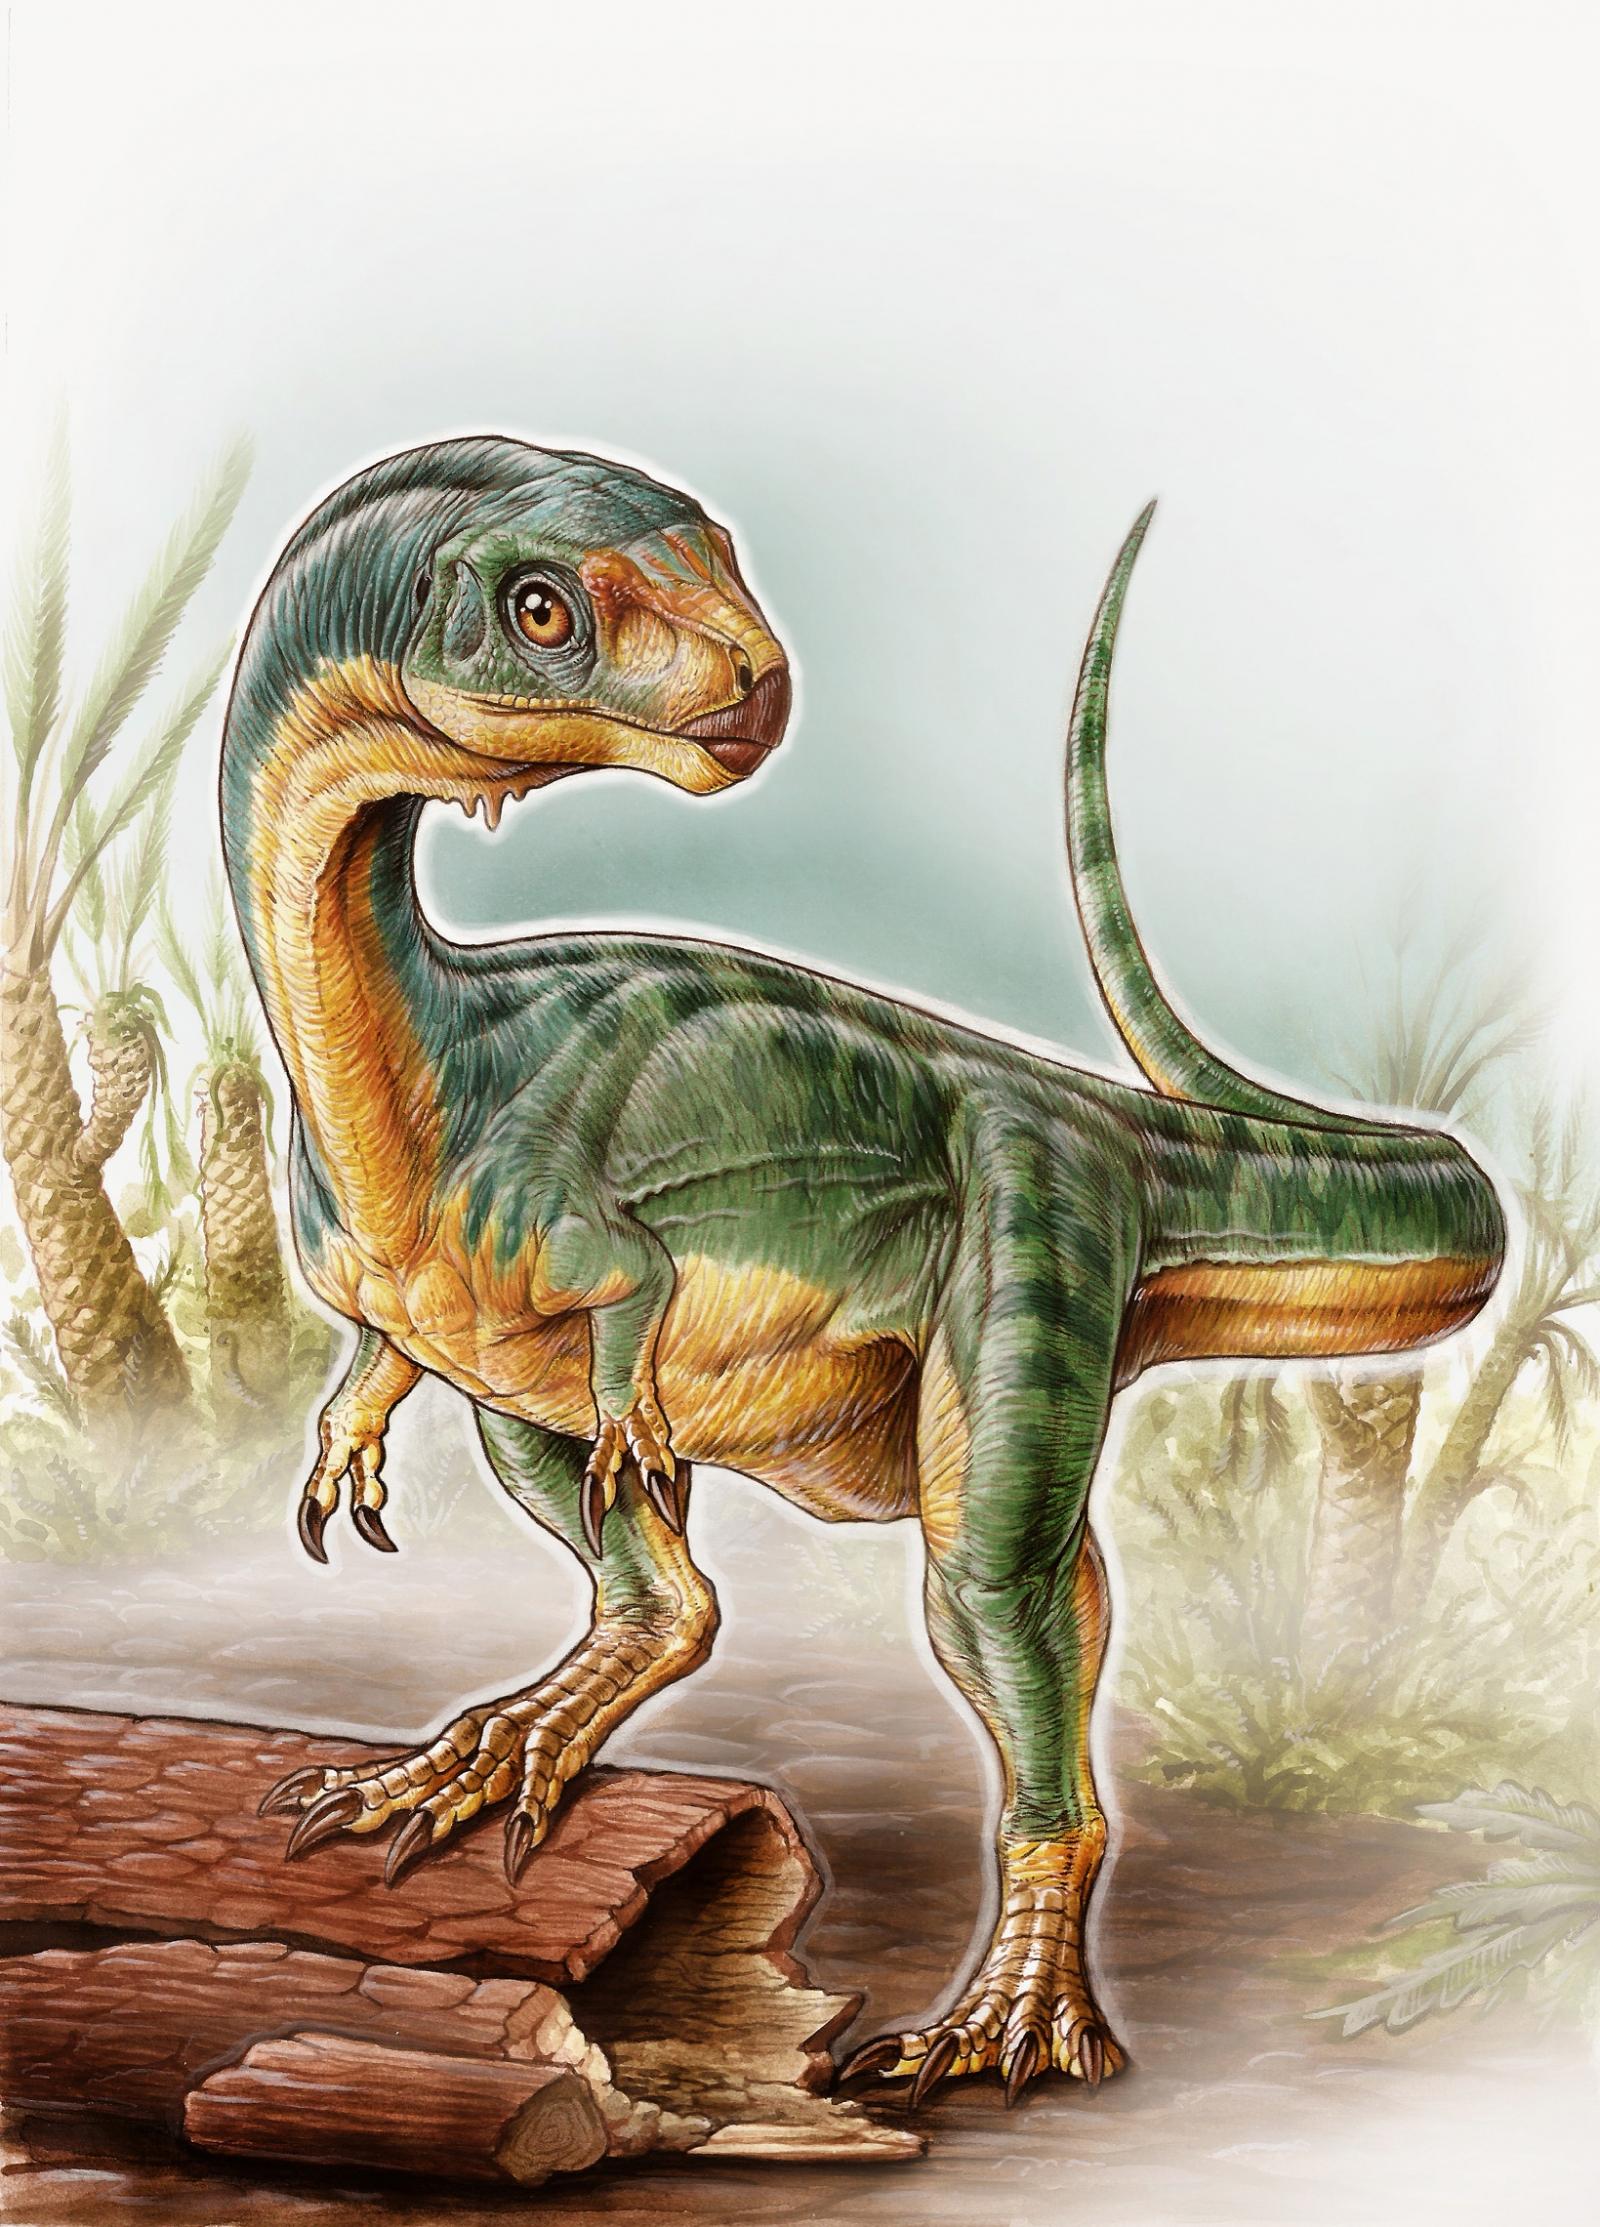 chilesaurus-dinosaur.jpg